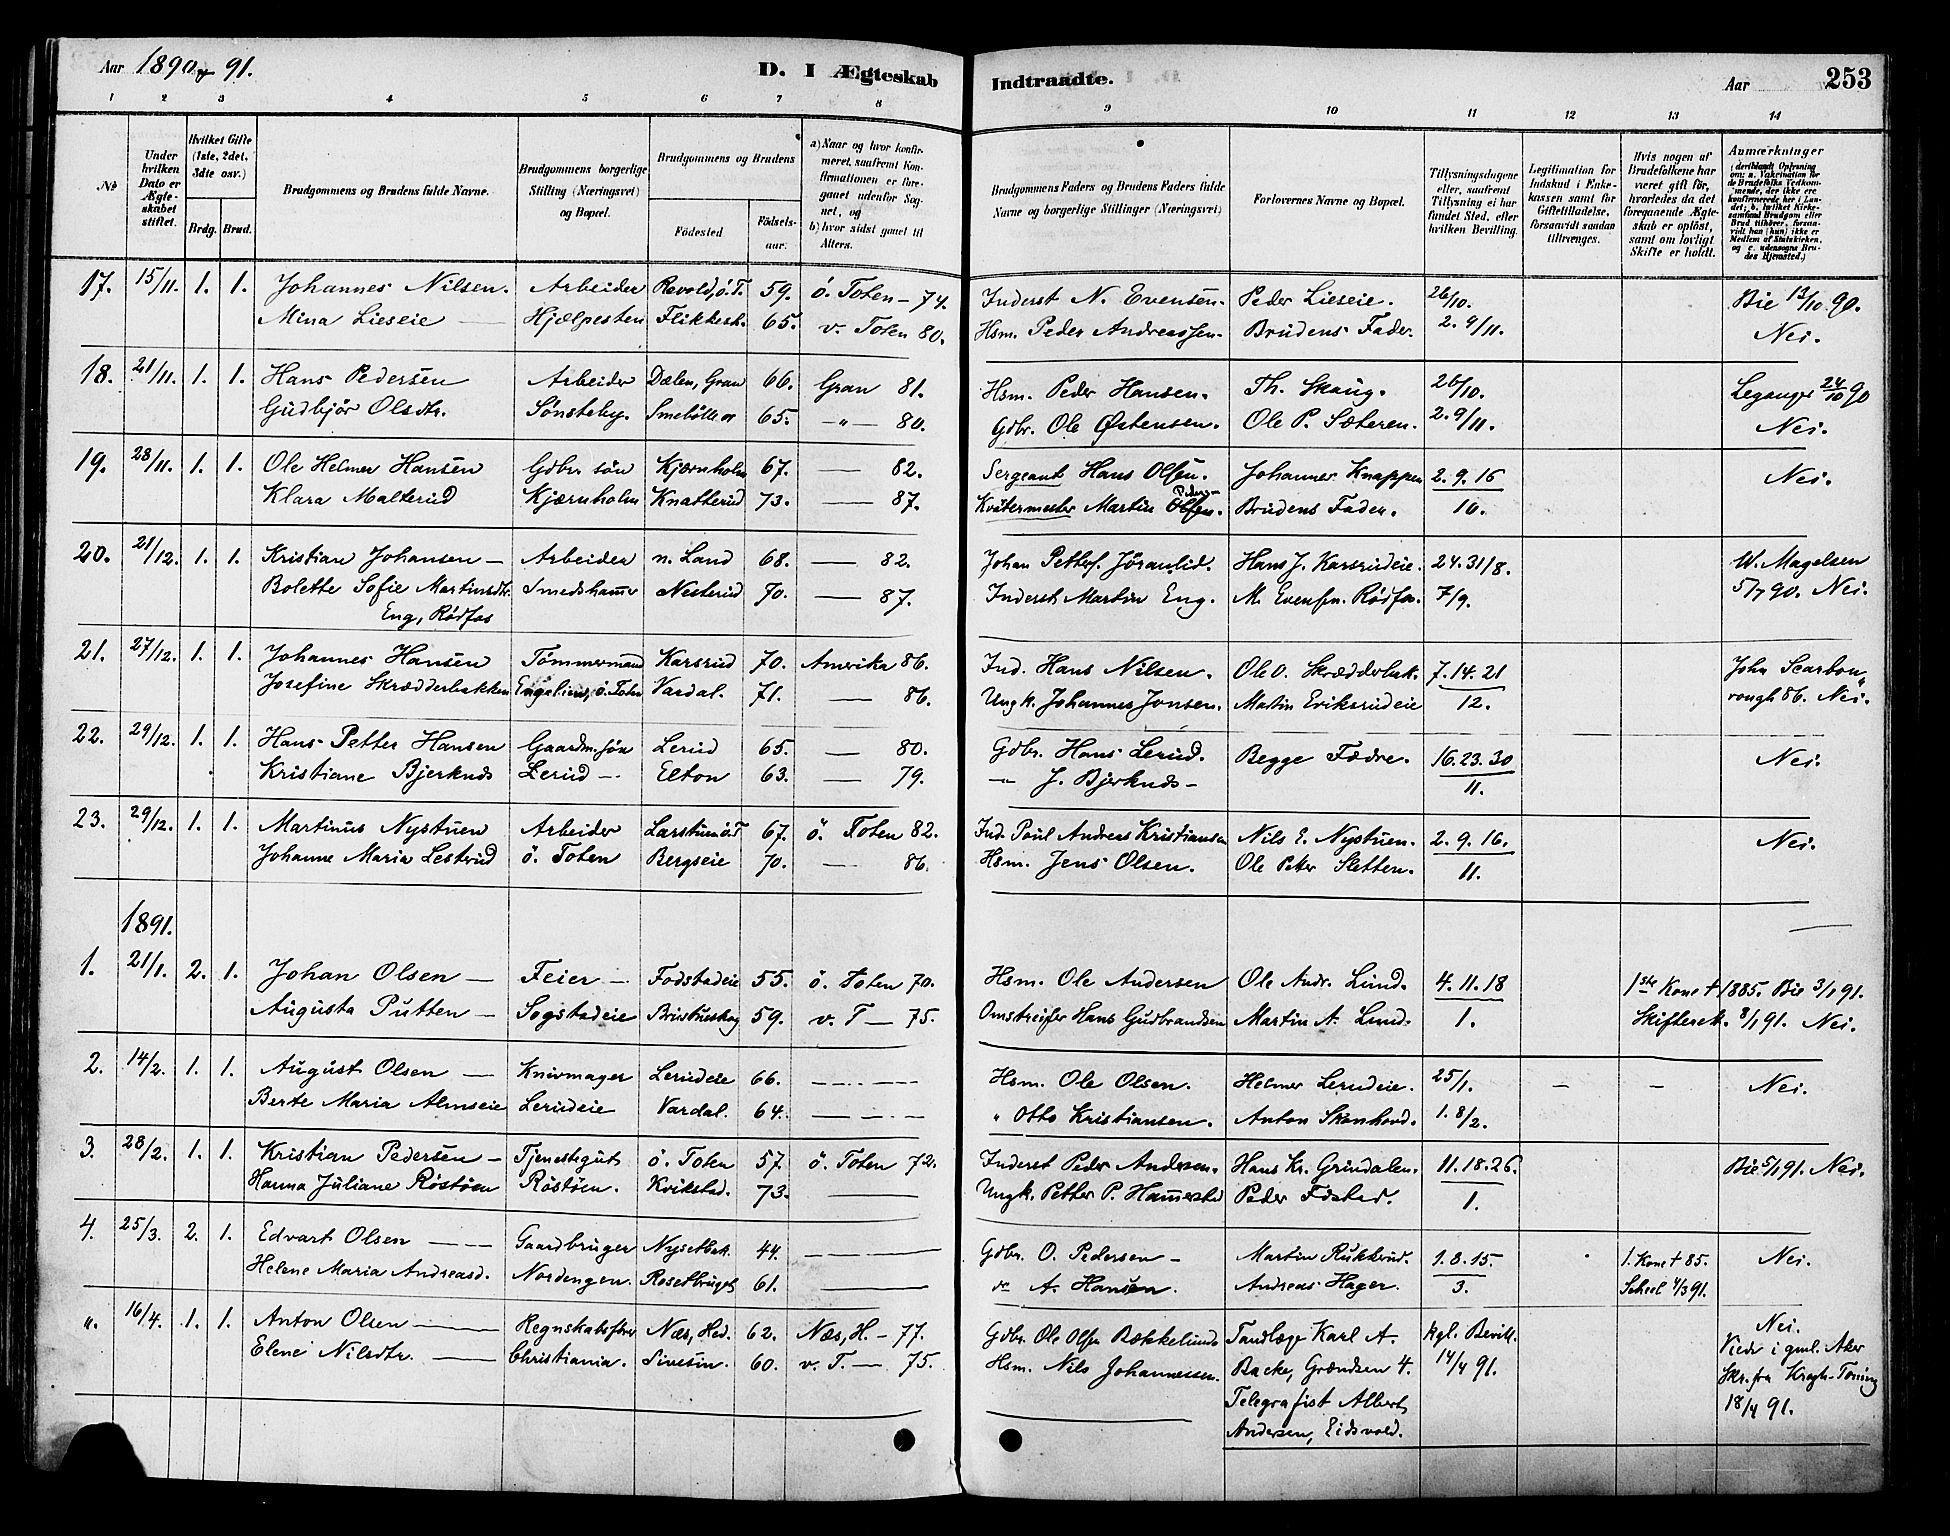 SAH, Vestre Toten prestekontor, H/Ha/Haa/L0009: Ministerialbok nr. 9, 1878-1894, s. 253